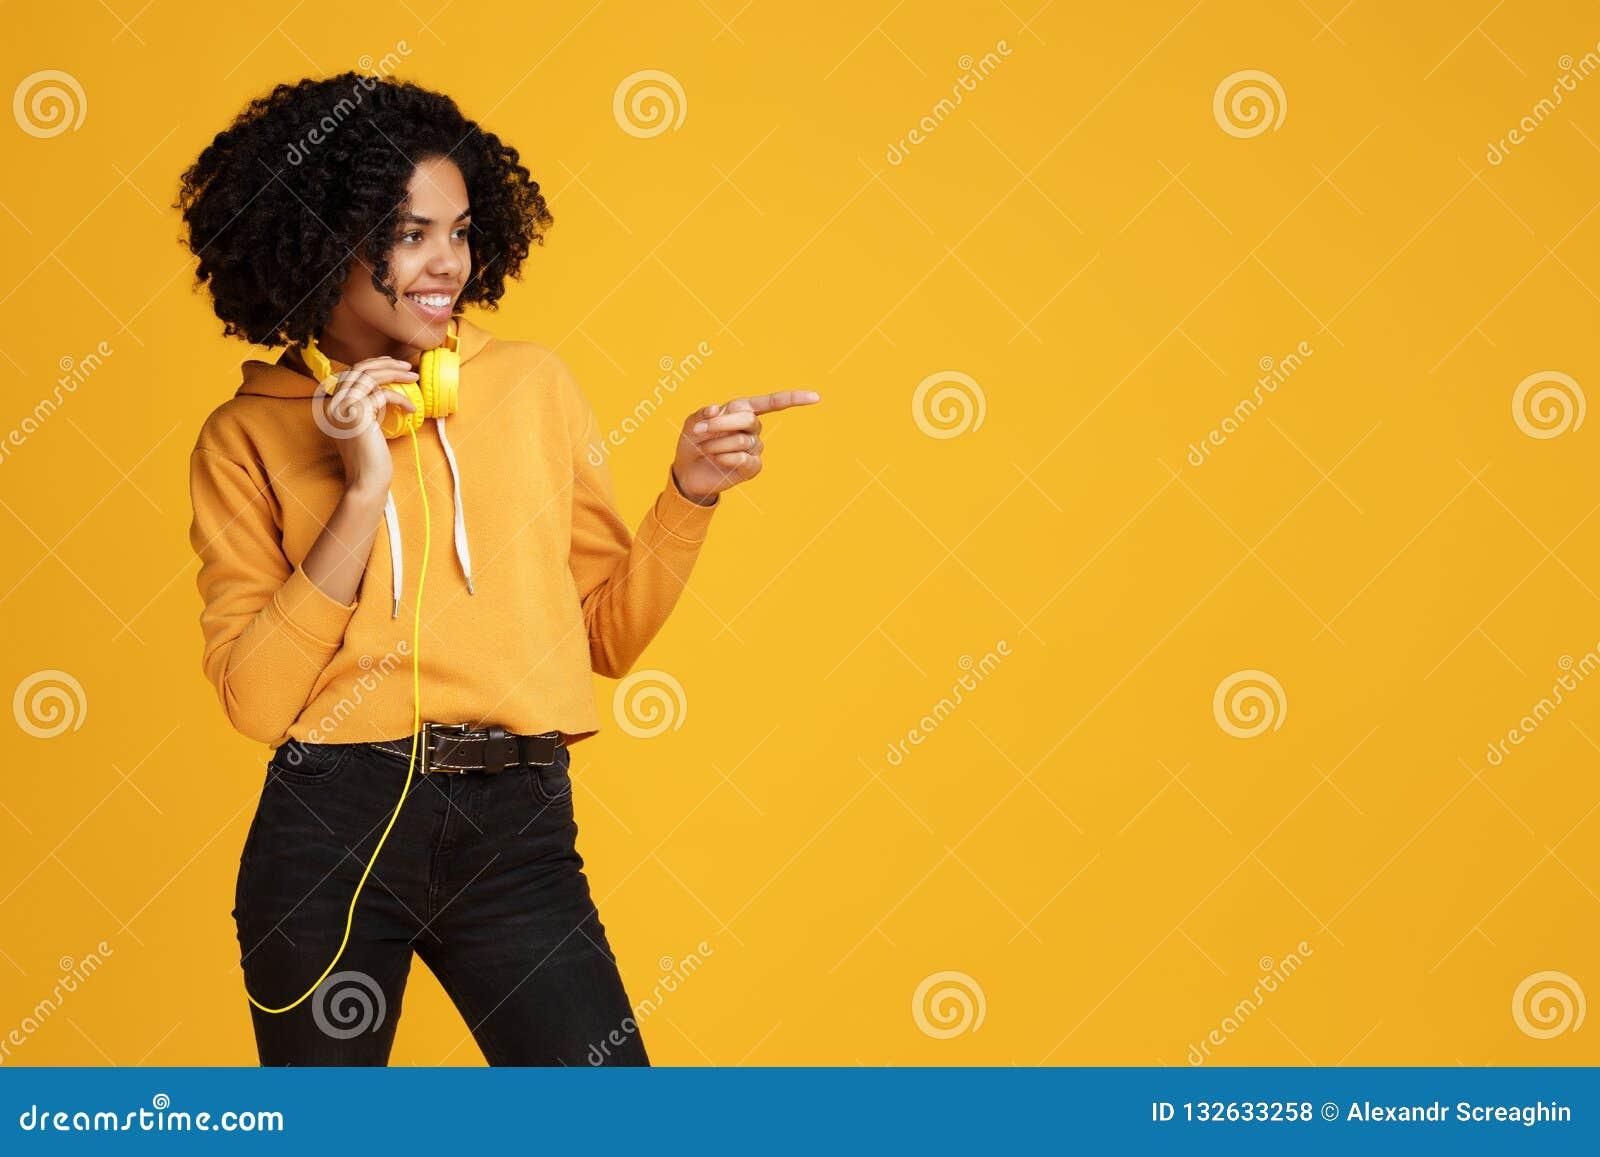 De knappe Afrikaanse Amerikaanse jonge vrouw met heldere glimlach kleedde zich in vrijetijdskleding en hoofdtelefoons die het ric